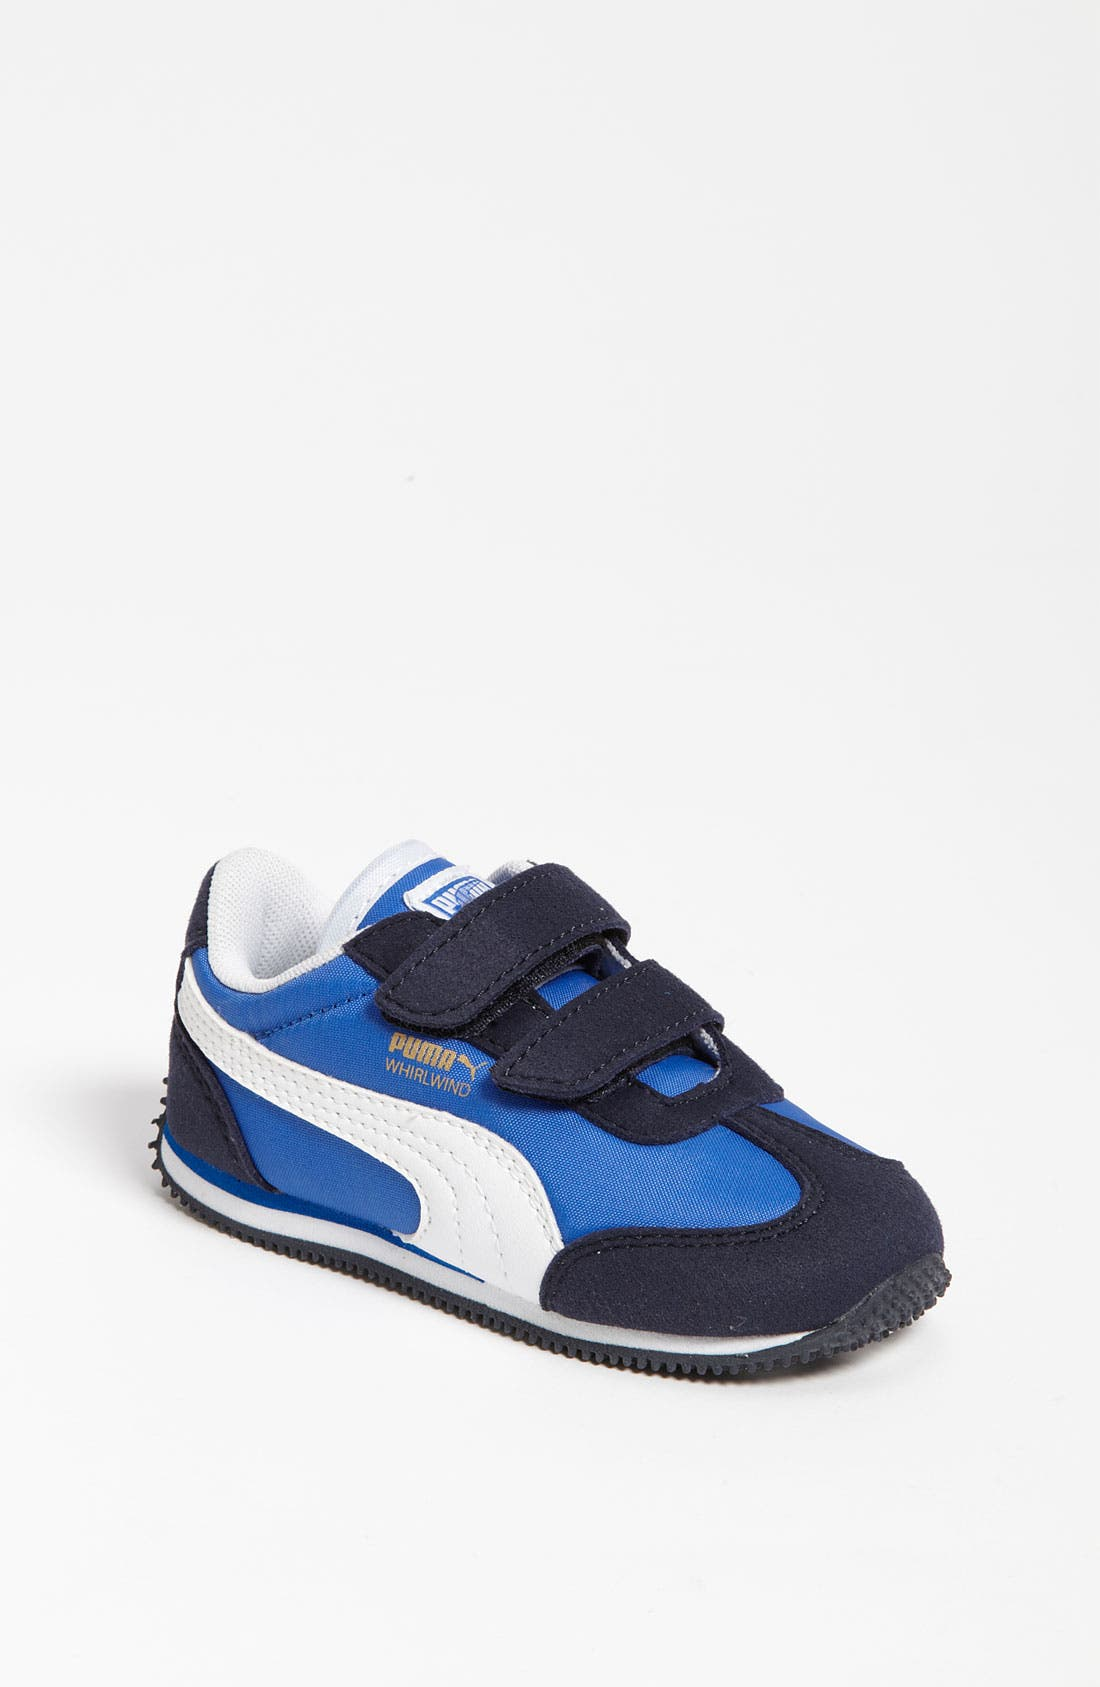 Main Image - PUMA 'Whirlwind' Sneaker (Baby, Walker, Toddler, Little Kid & Big Kid)